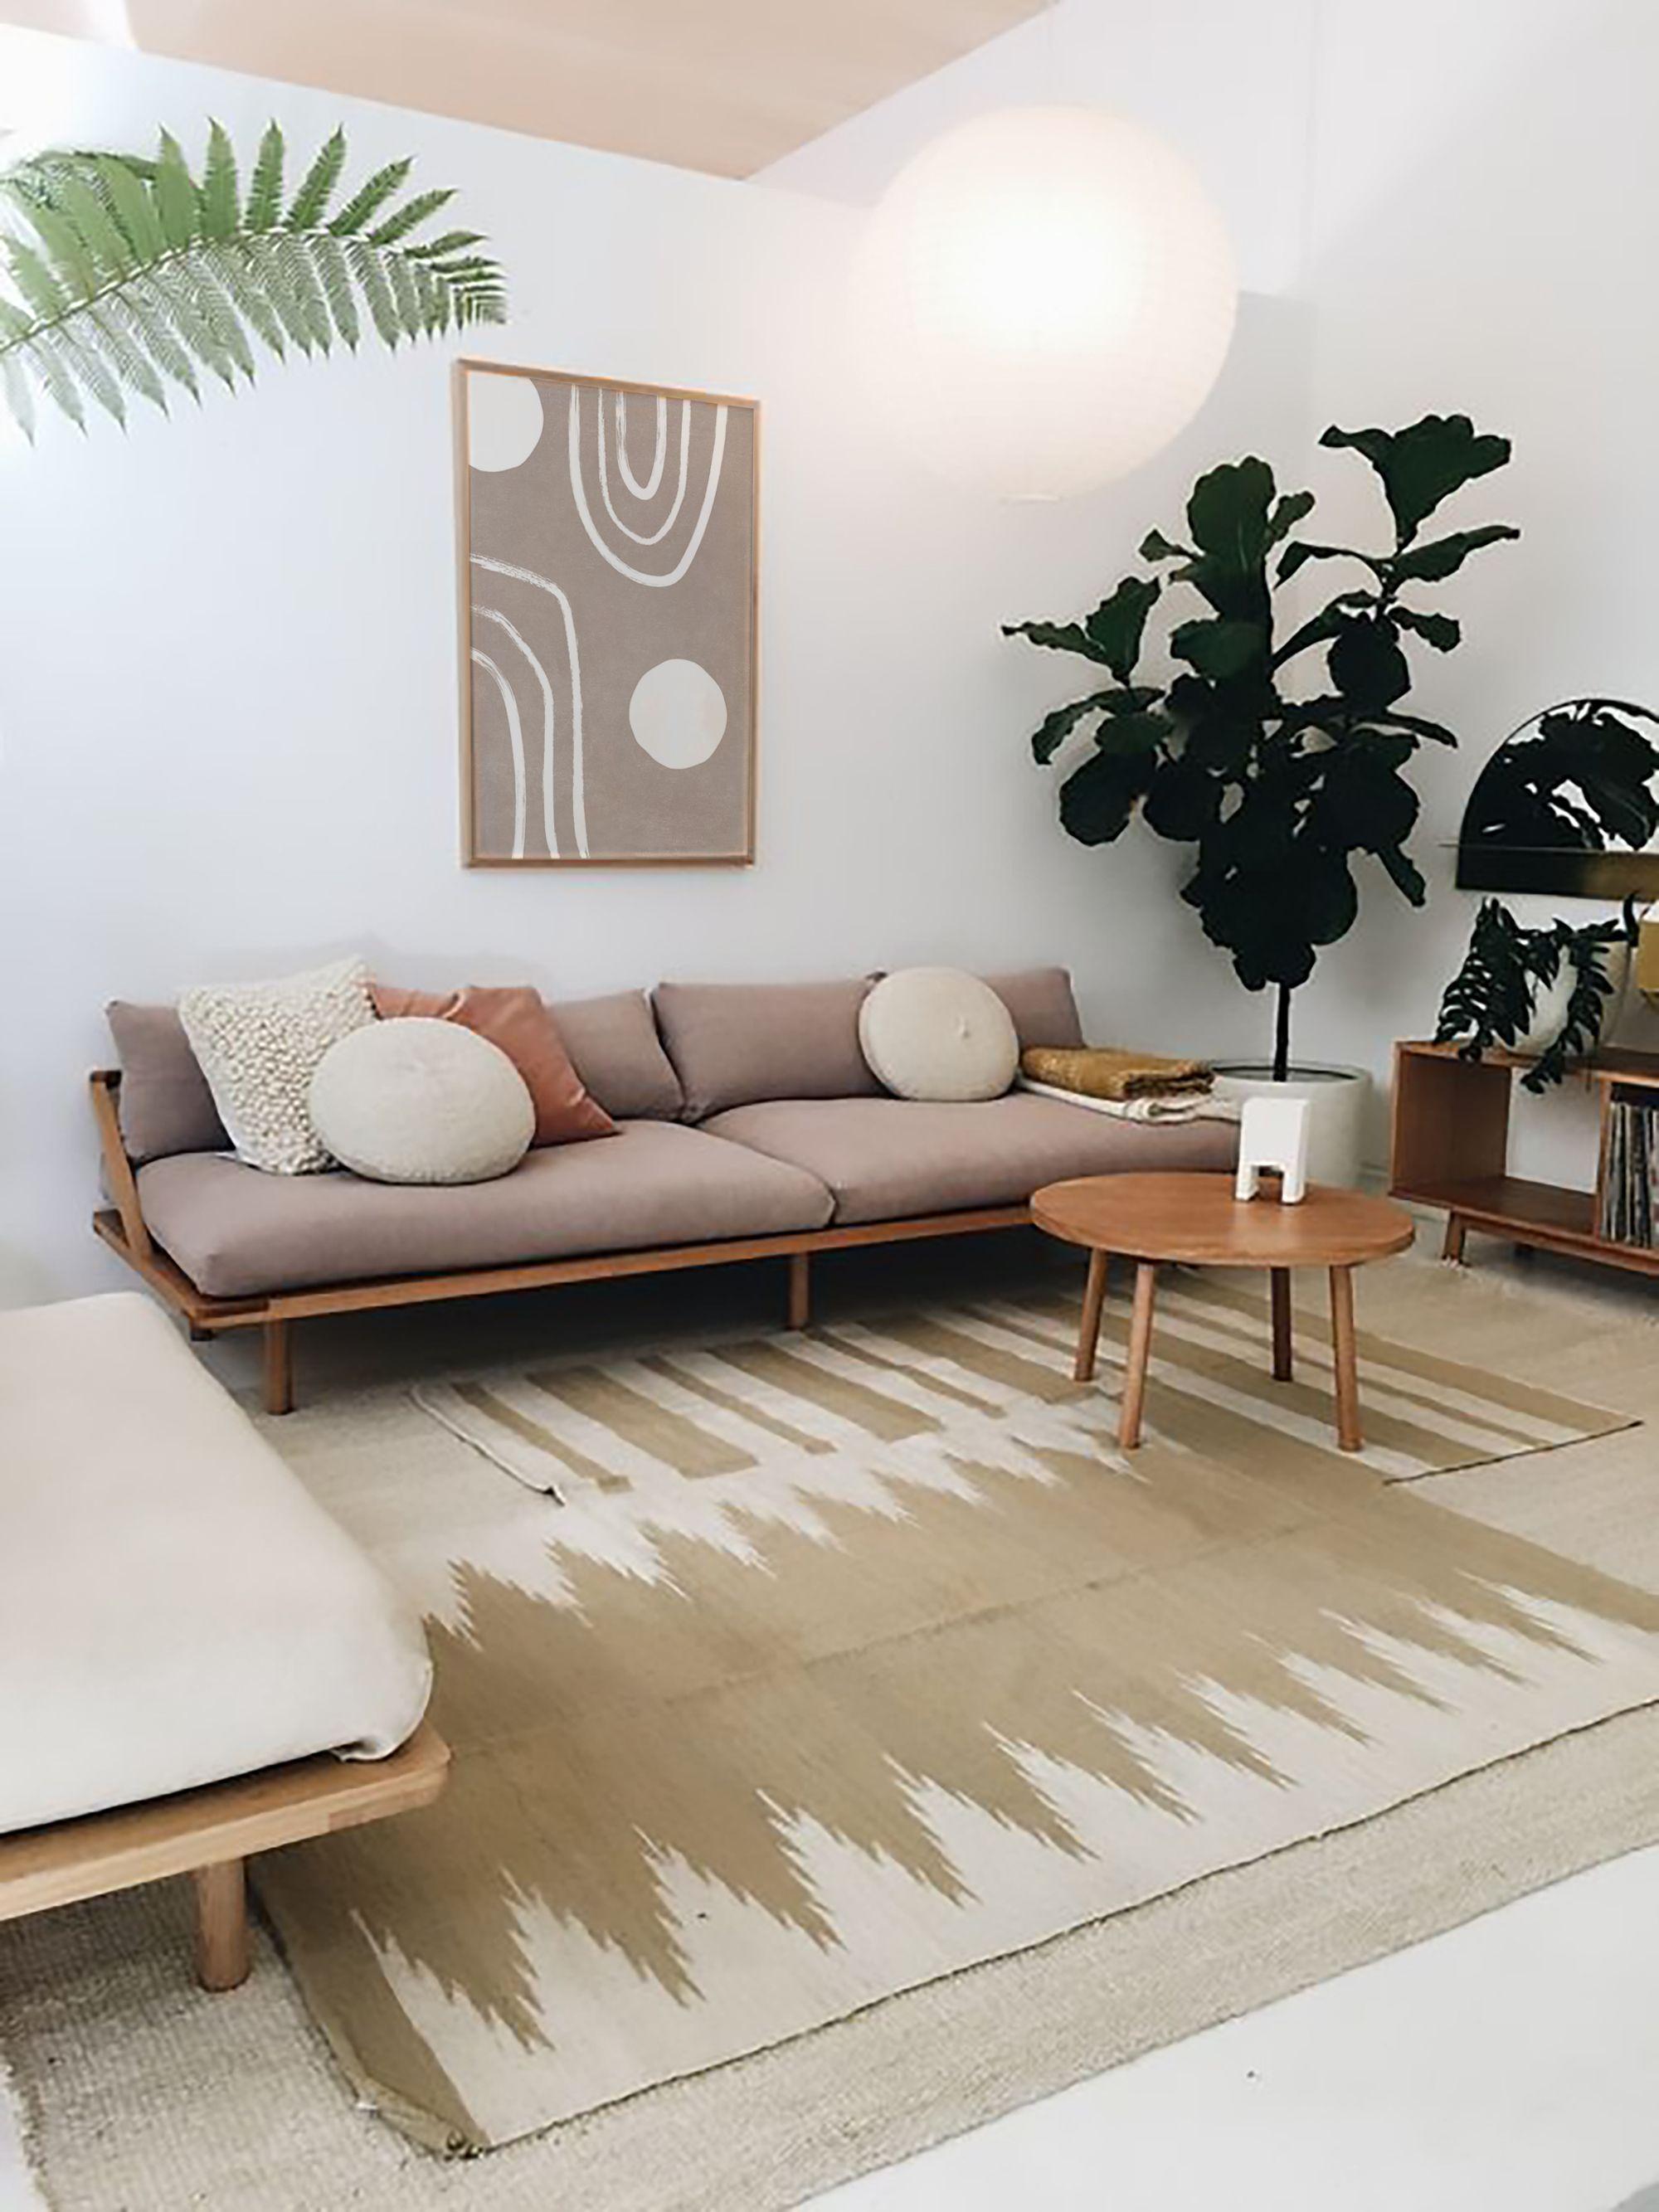 Boho White Brown Circle Line Art Modern Minimal Abstract Etsy In 2021 Living Room Scandinavian Home Decor Bedroom Living Room Wood